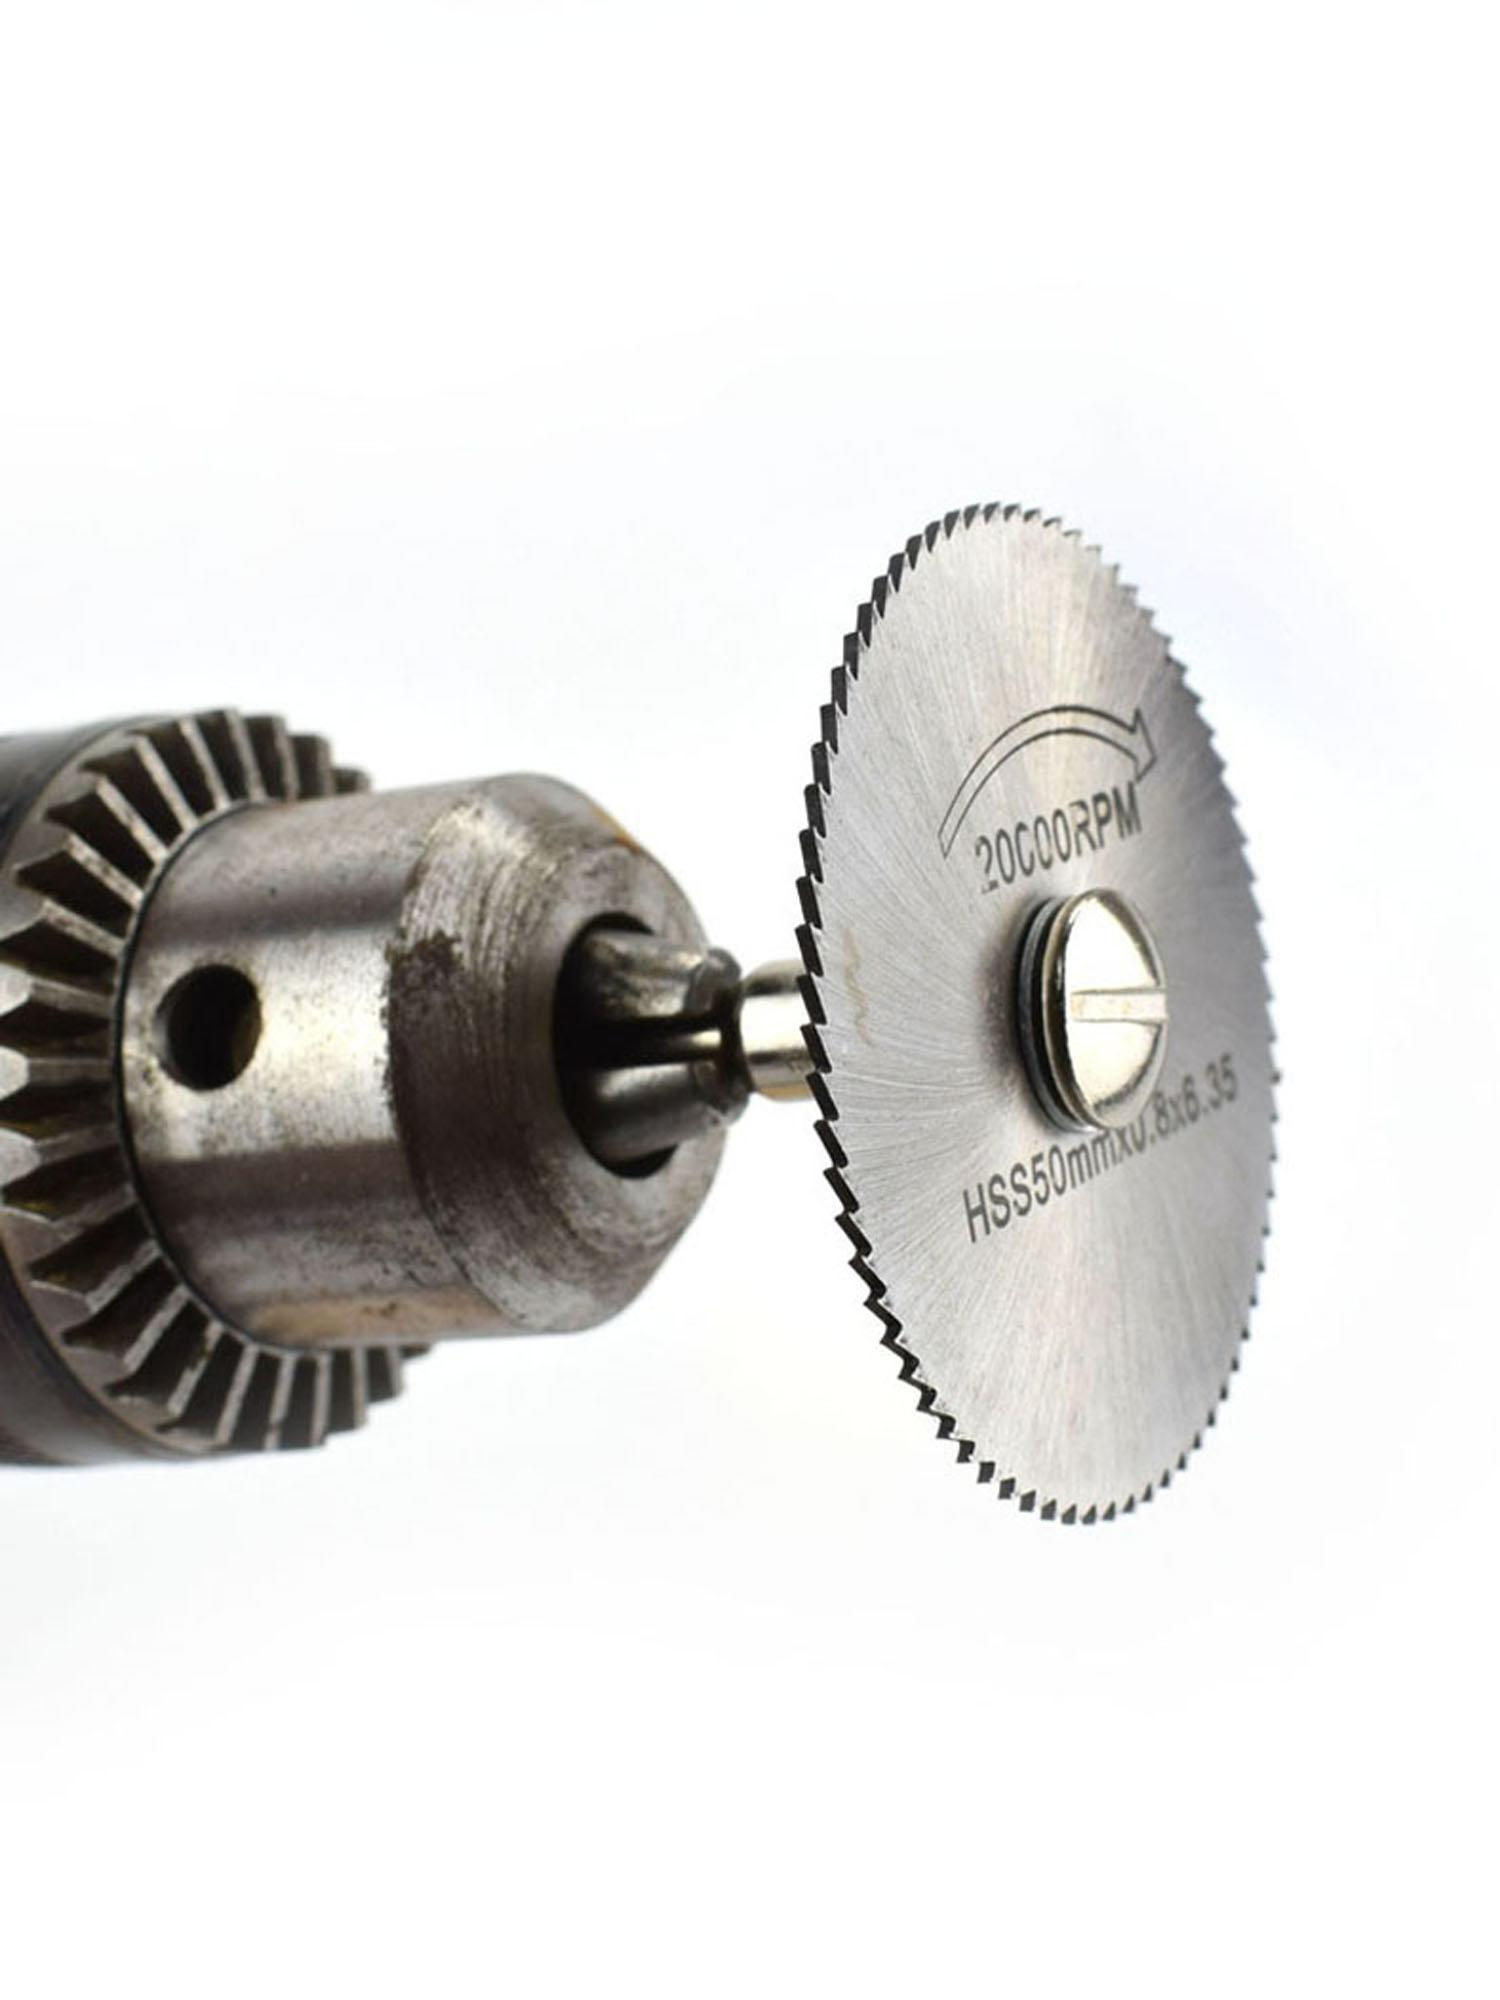 Cutting Discs Mini Circular Saw Blades Cutter Discs Mandrel Cutoff Pow 0.8-2inch